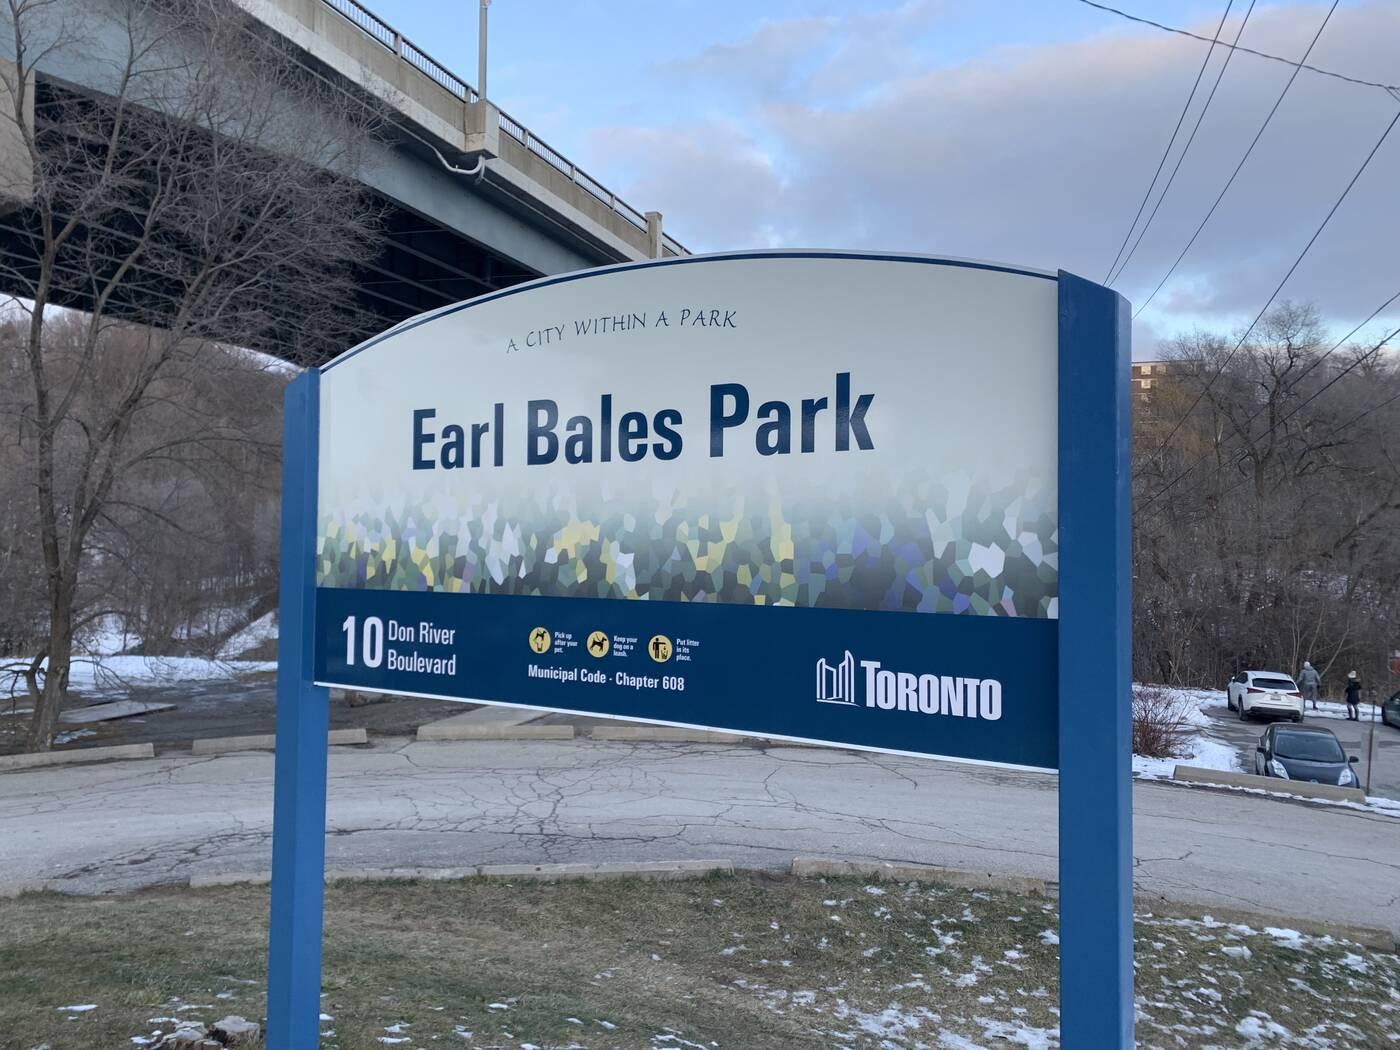 earl bales park toronto